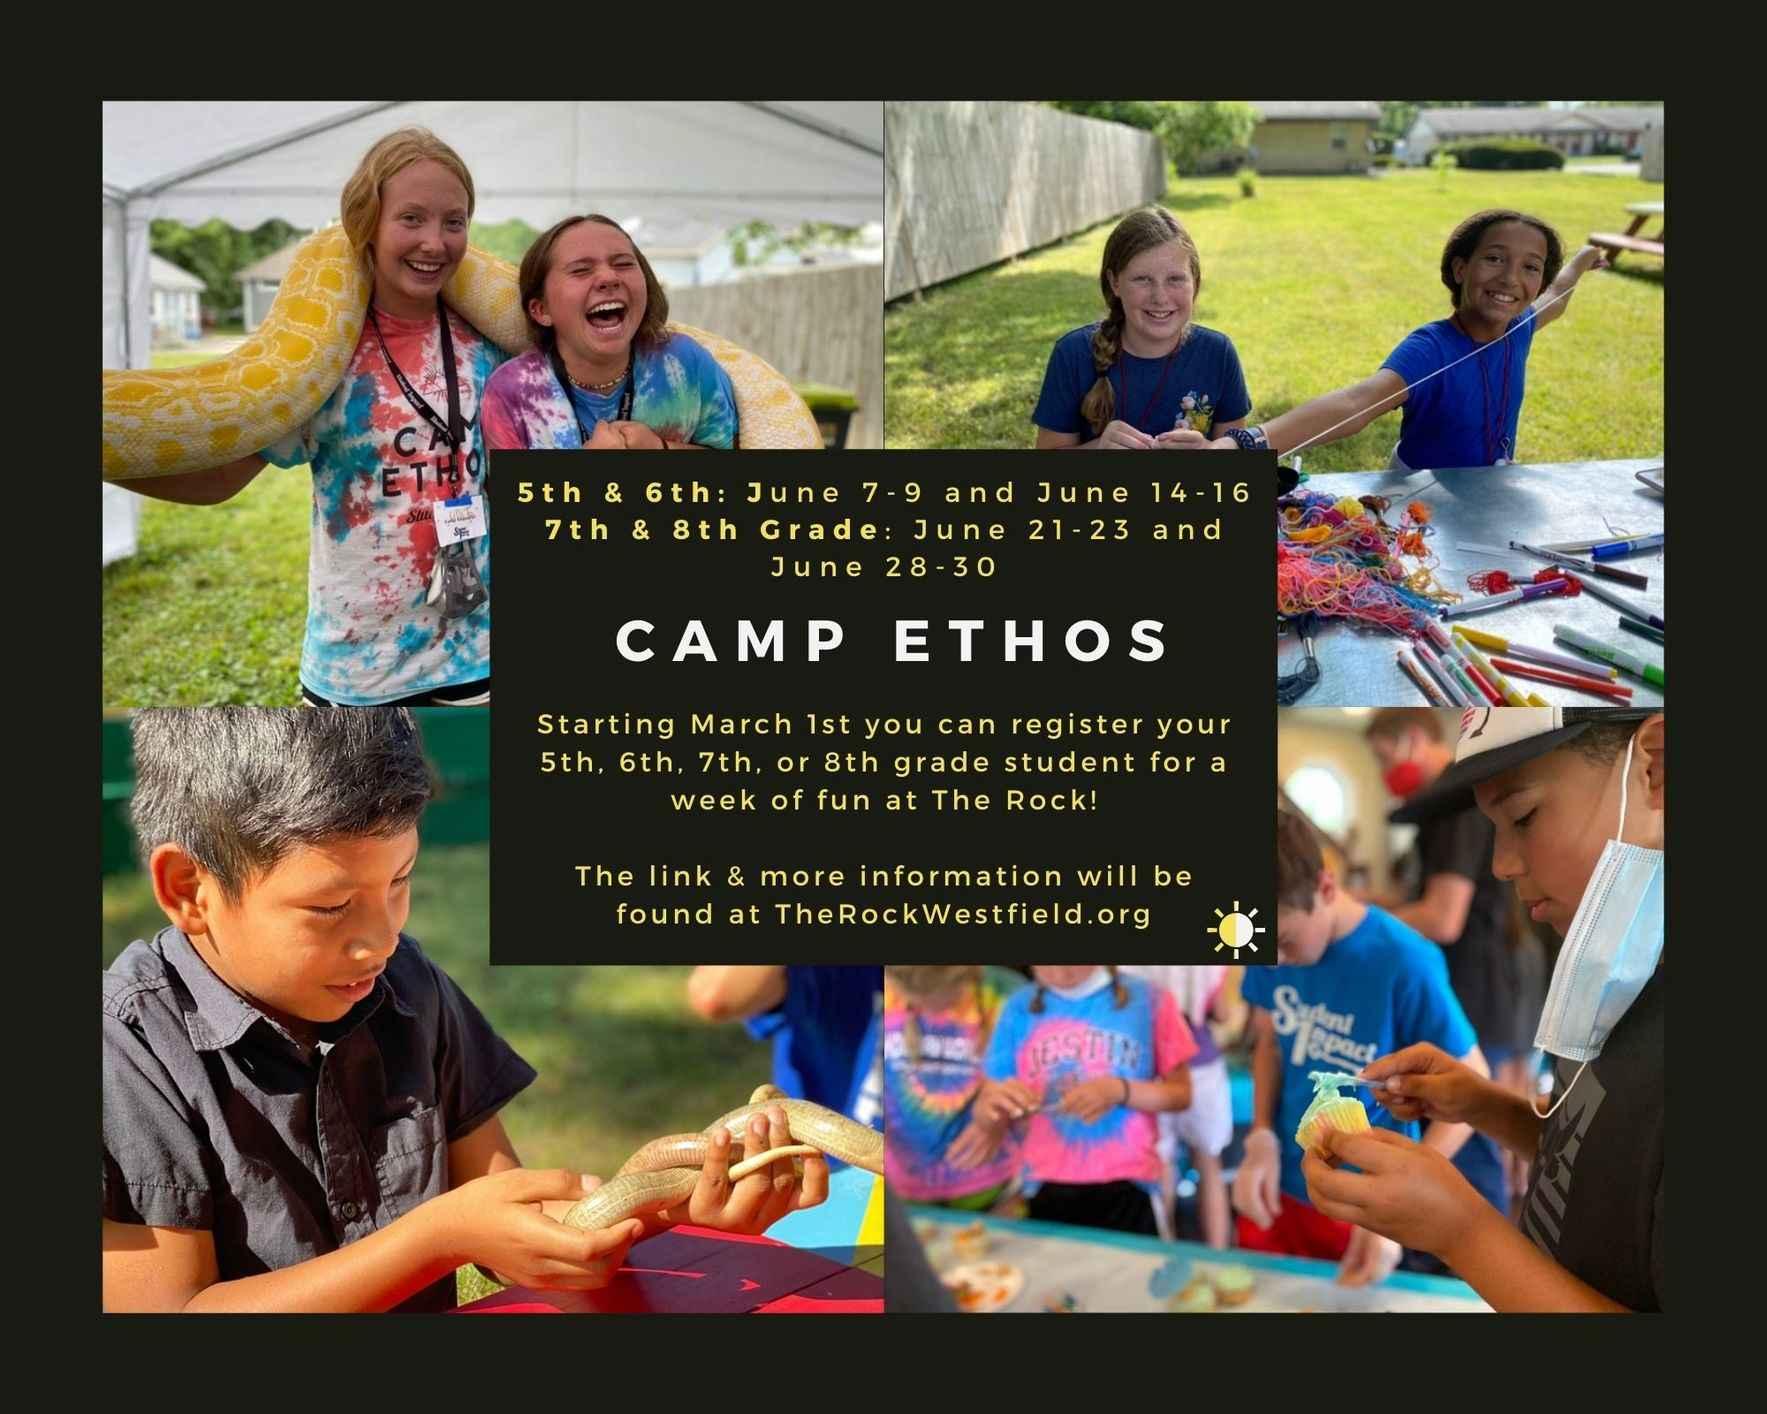 Camp Ethos June 7-9, 2021 Incoming 5-6th grade image